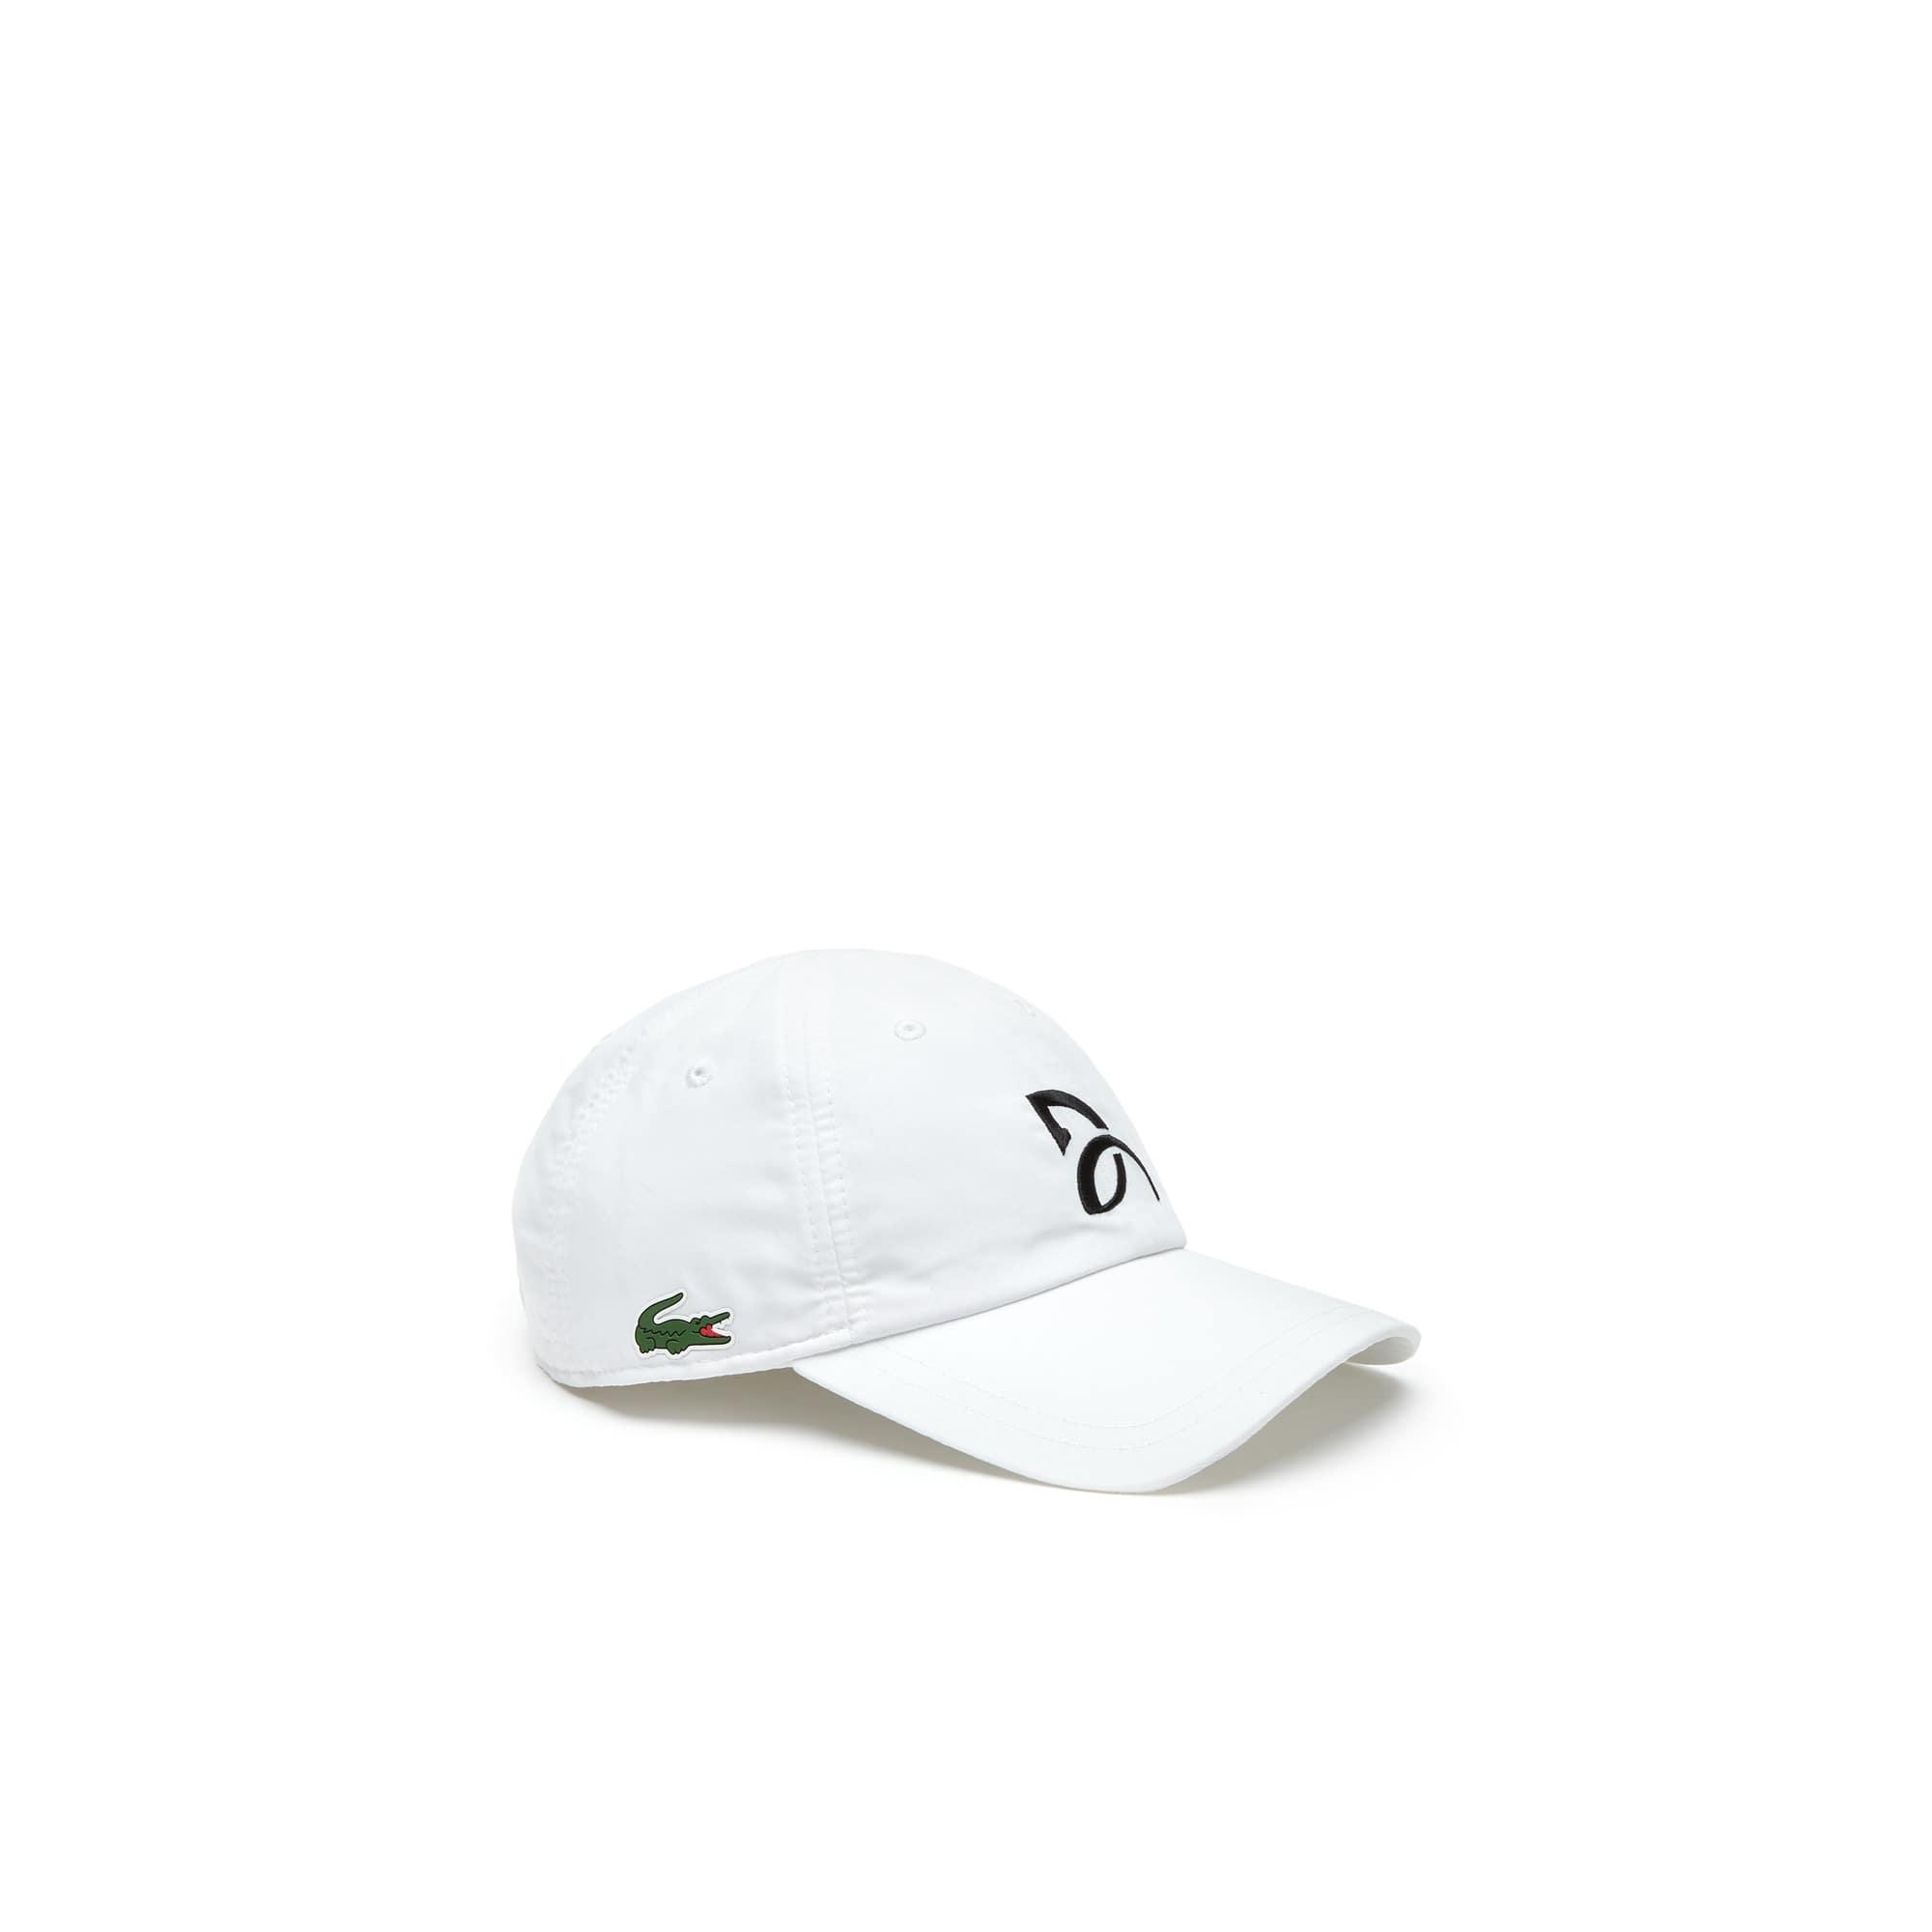 Men's SPORT Tennis Microfiber Cap - Novak Djokovic Supporter Collection